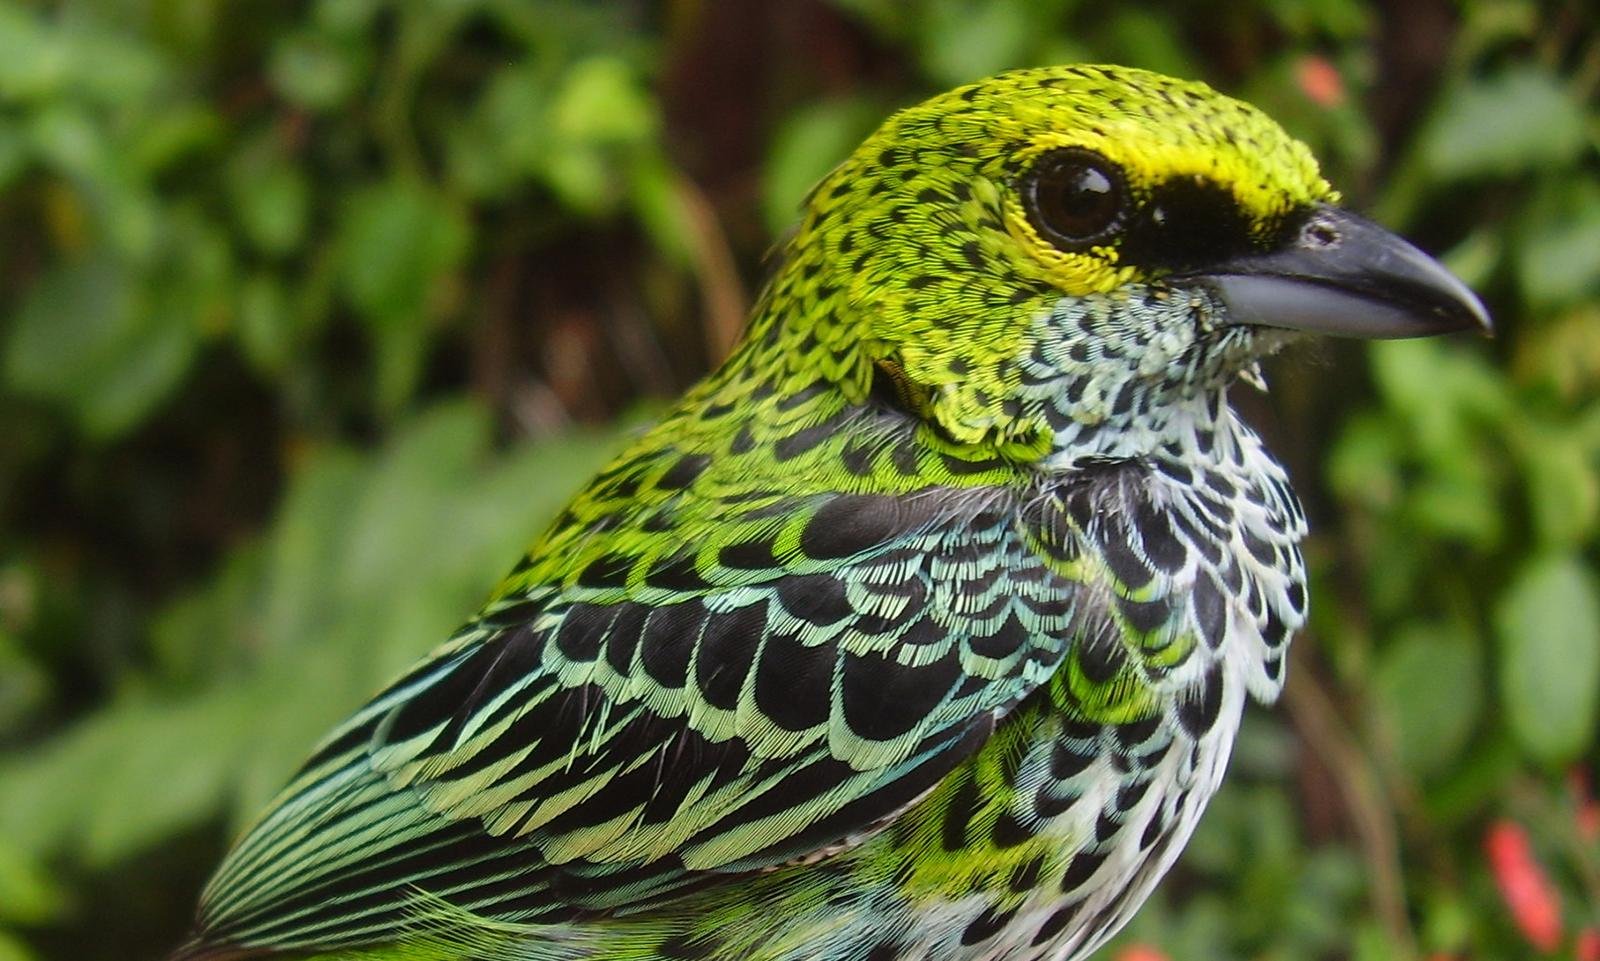 speckled tanager